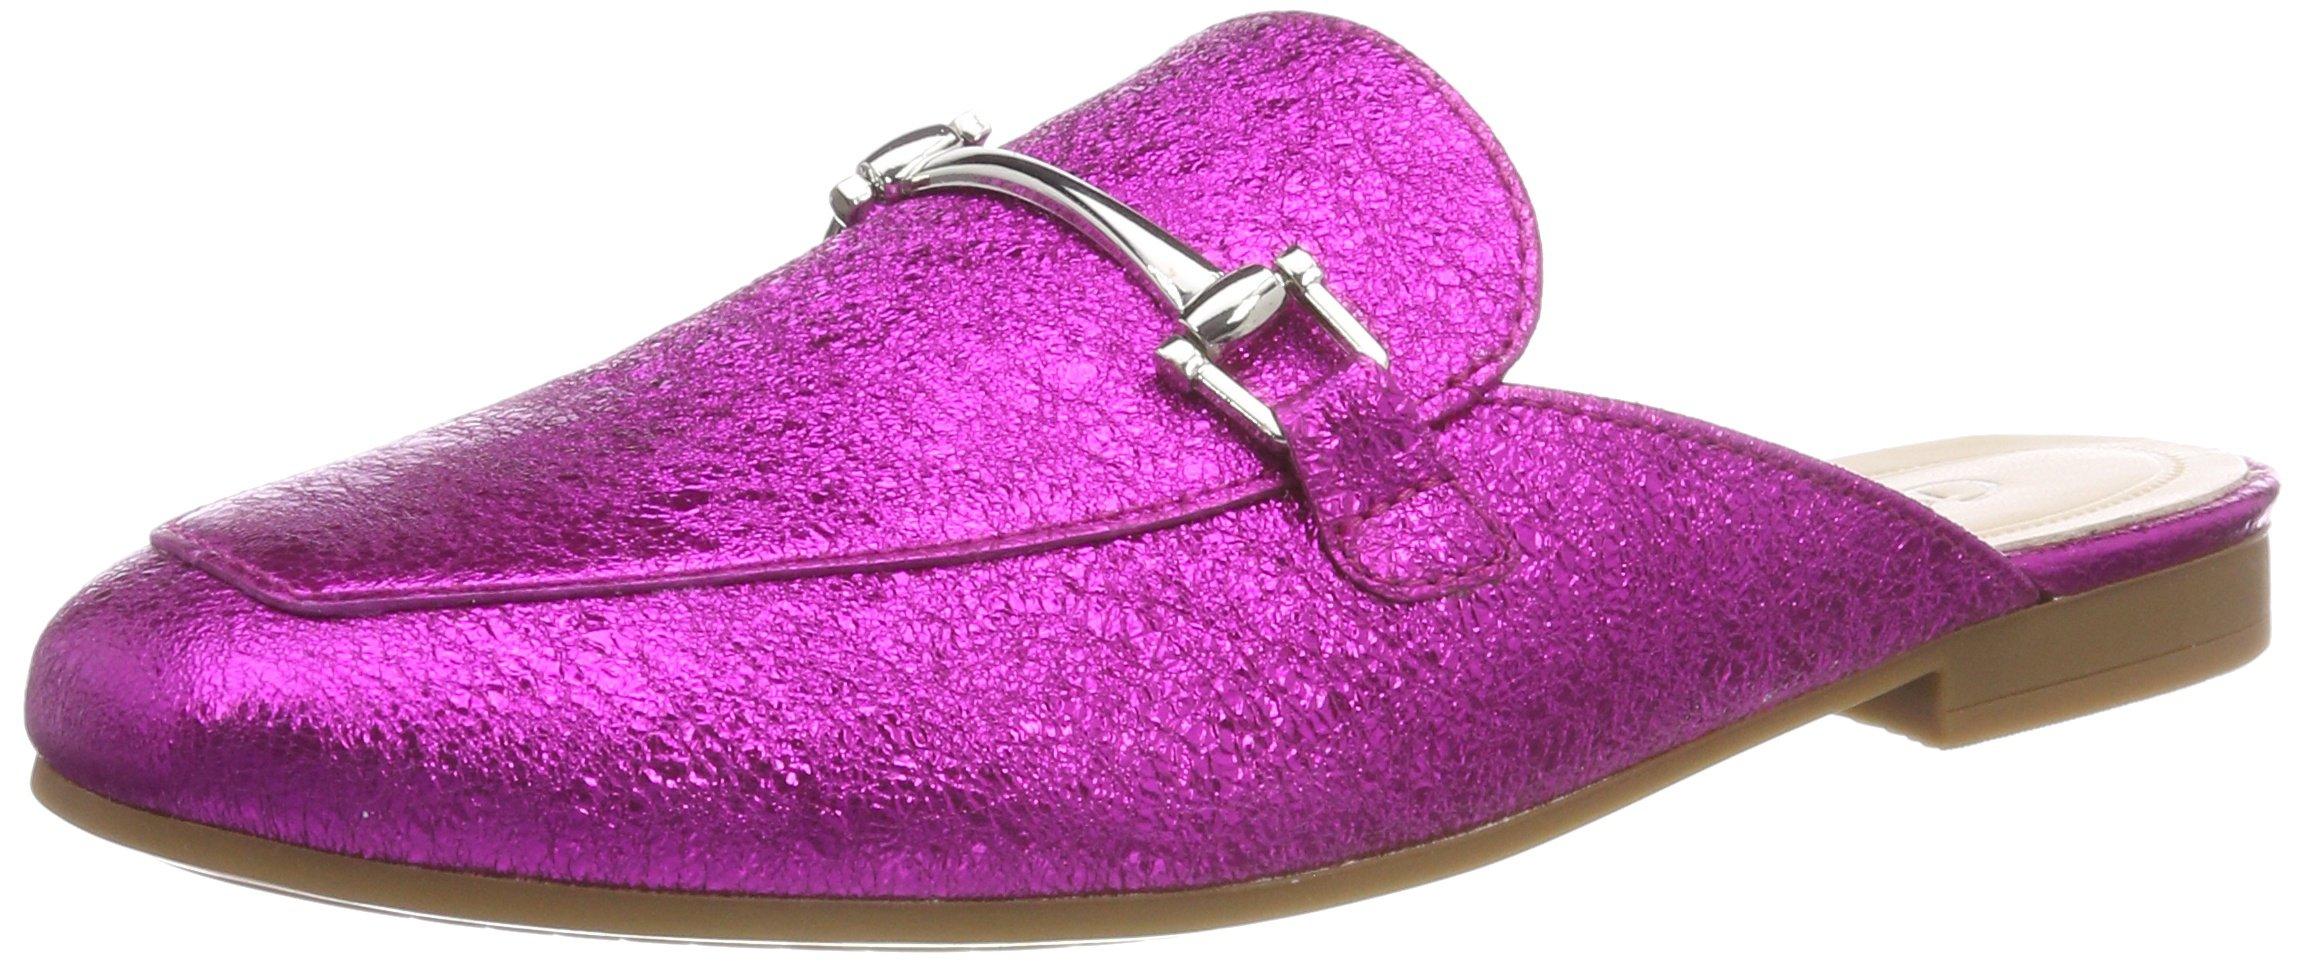 Shoes Gabor BasicMules FemmeMulticolorepink39 Eu Gabor XNO0P8nkw